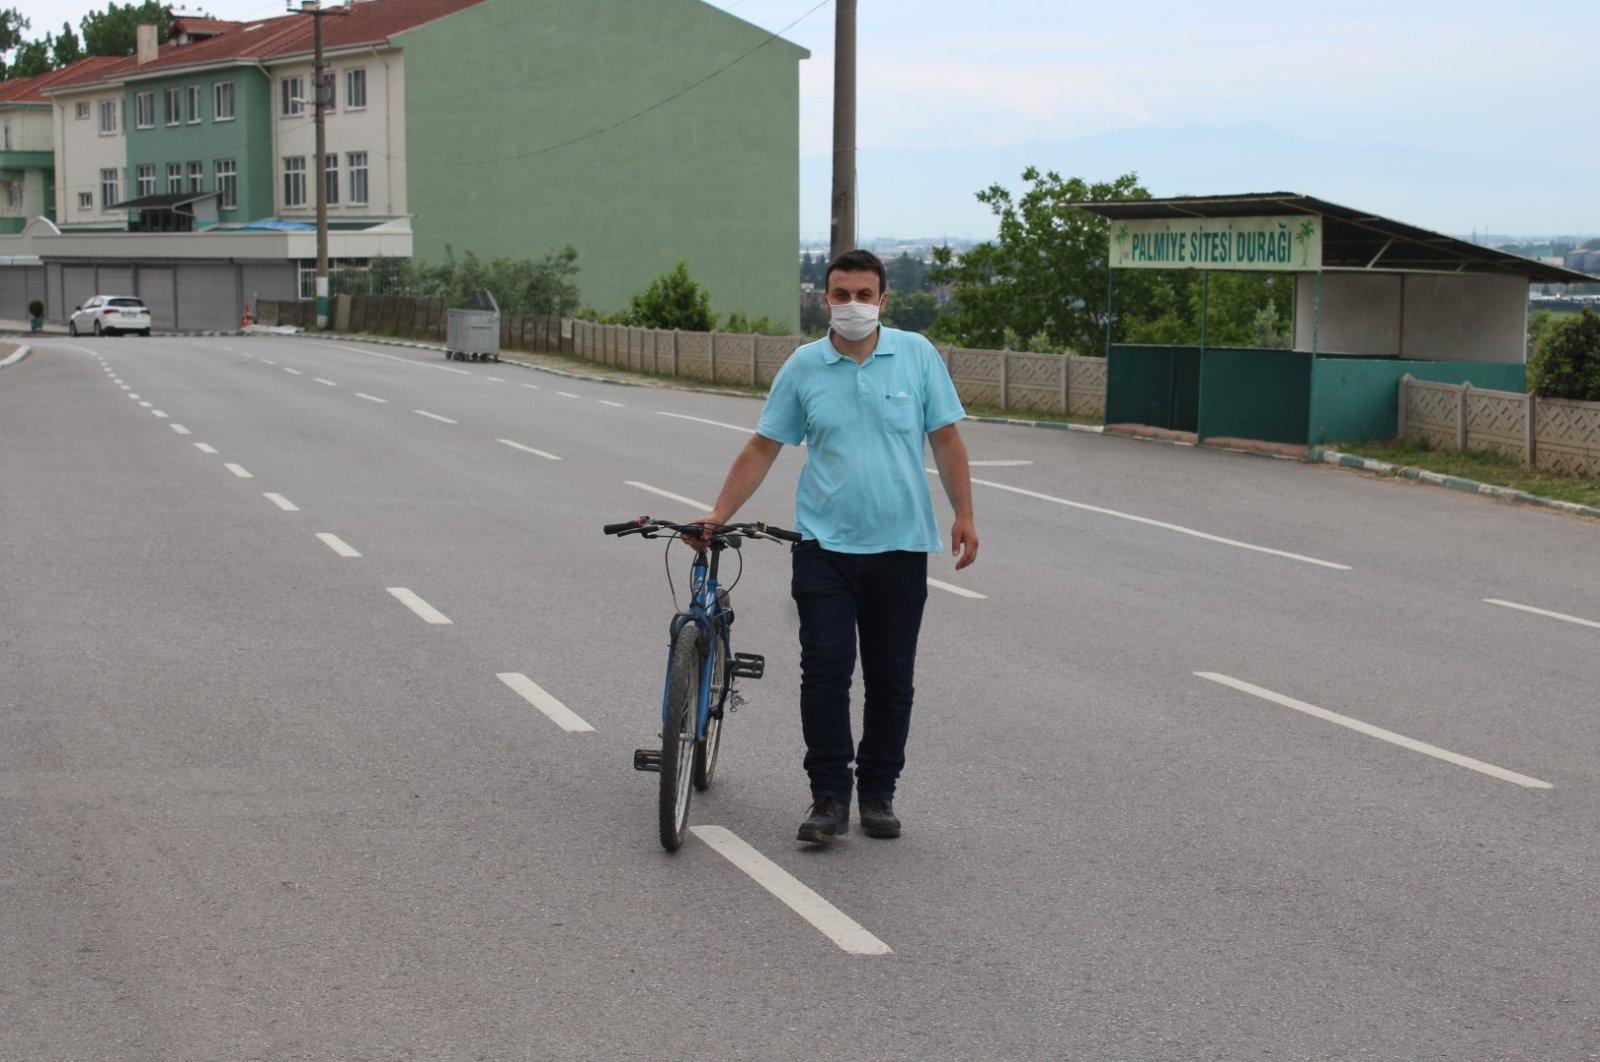 Mustafa Akçay traveled to Çanakkale province by bicycle to see his daughter, Sakarya, Turkey, June 1, 2020. (DHA Photo)